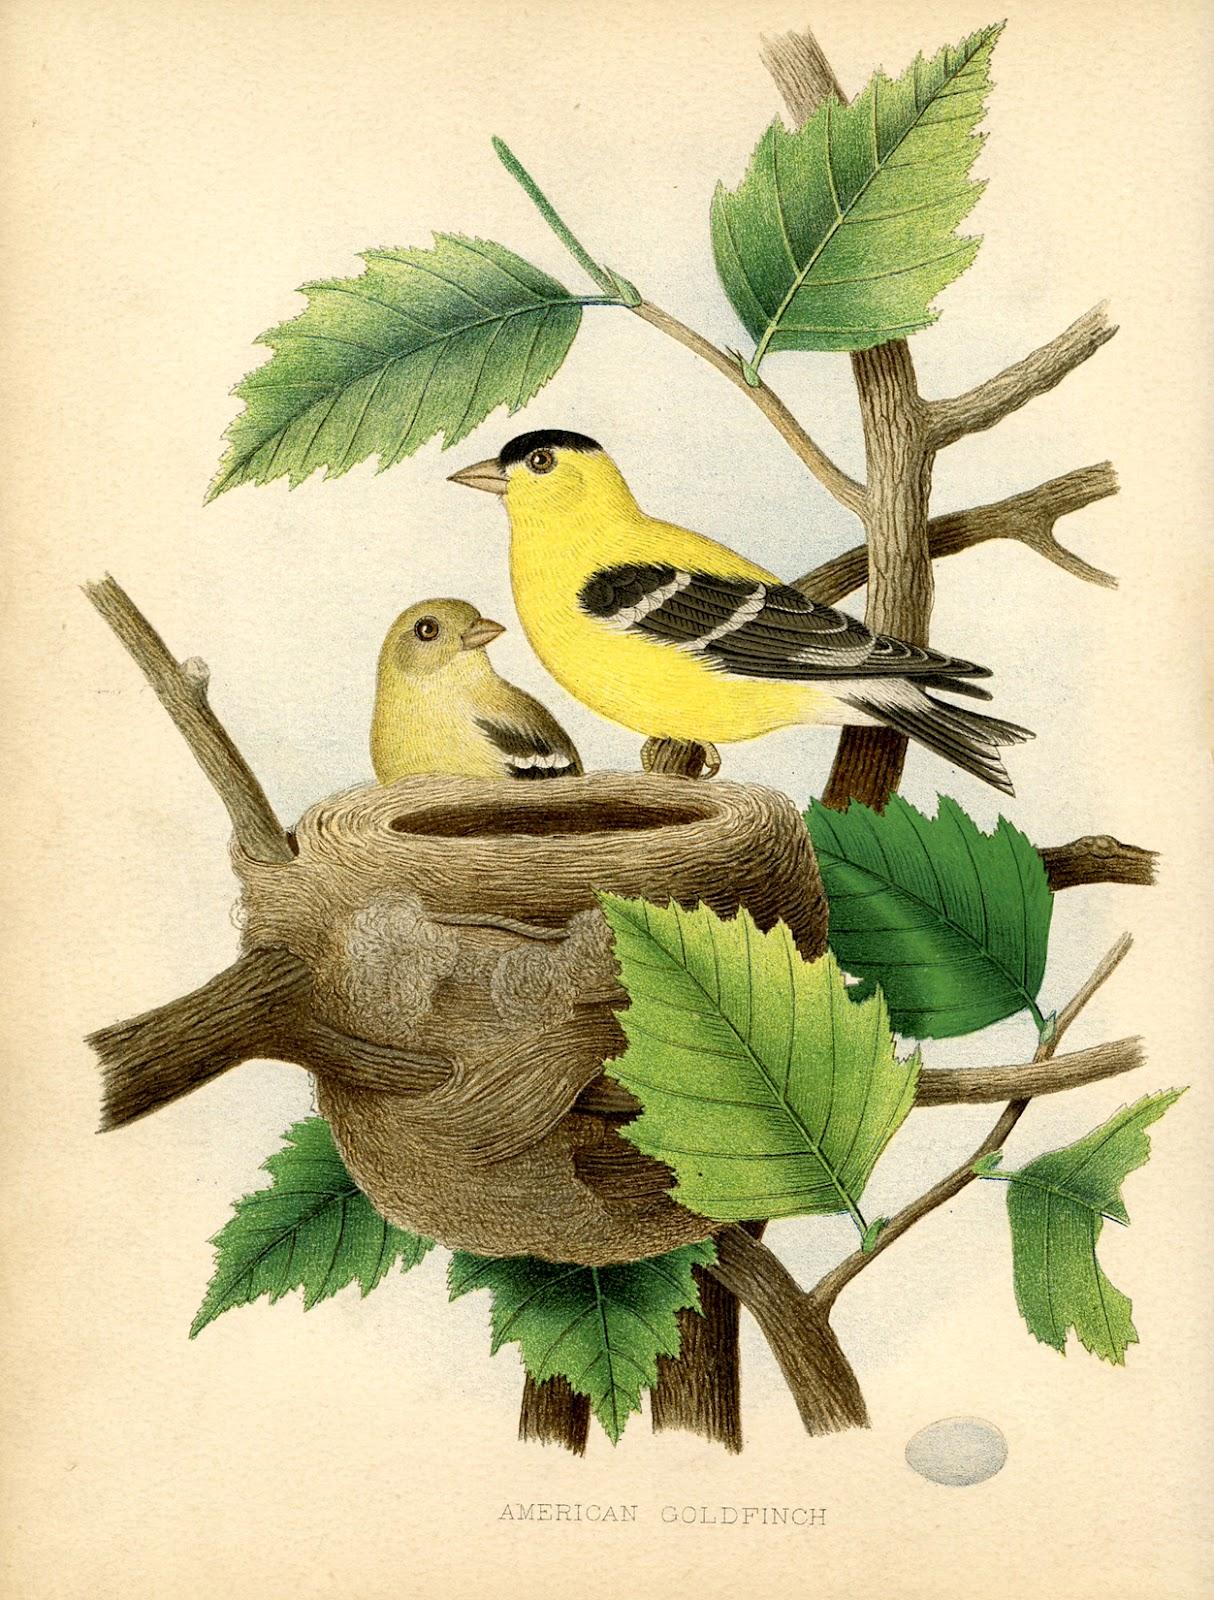 goldfinch+nest+vintage+image+GraphicsFairysm.jpg